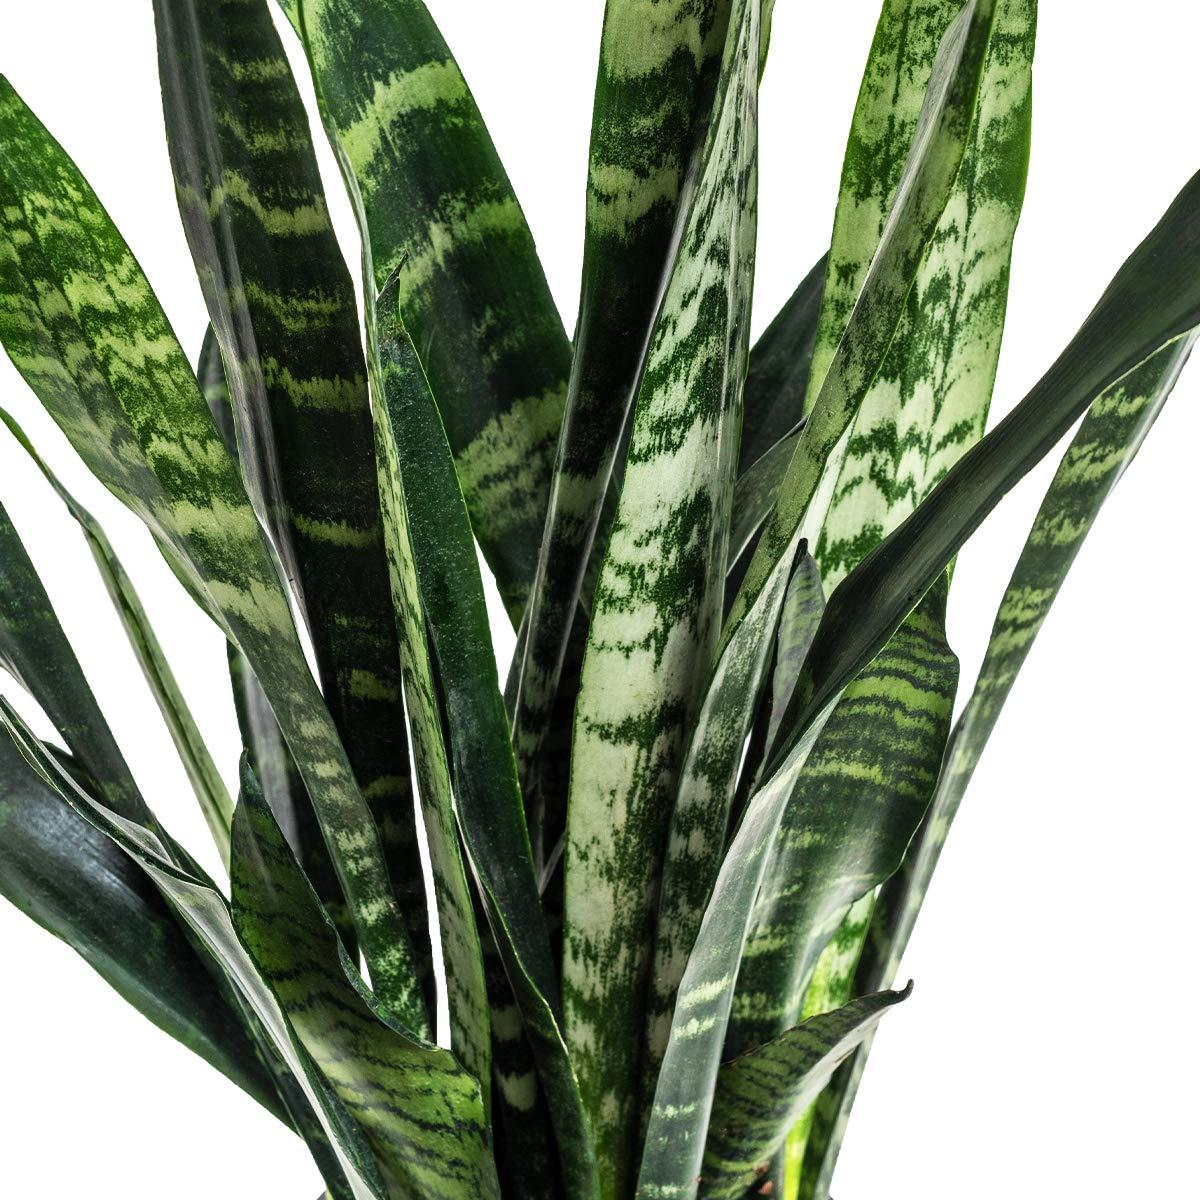 Burpee ' 'Black Coral' Snake Plant     Sansevieria trificiata   Indirect Medium Light     Live Easy Care Houseplant, 6'' Pot by Burpee (Image #3)